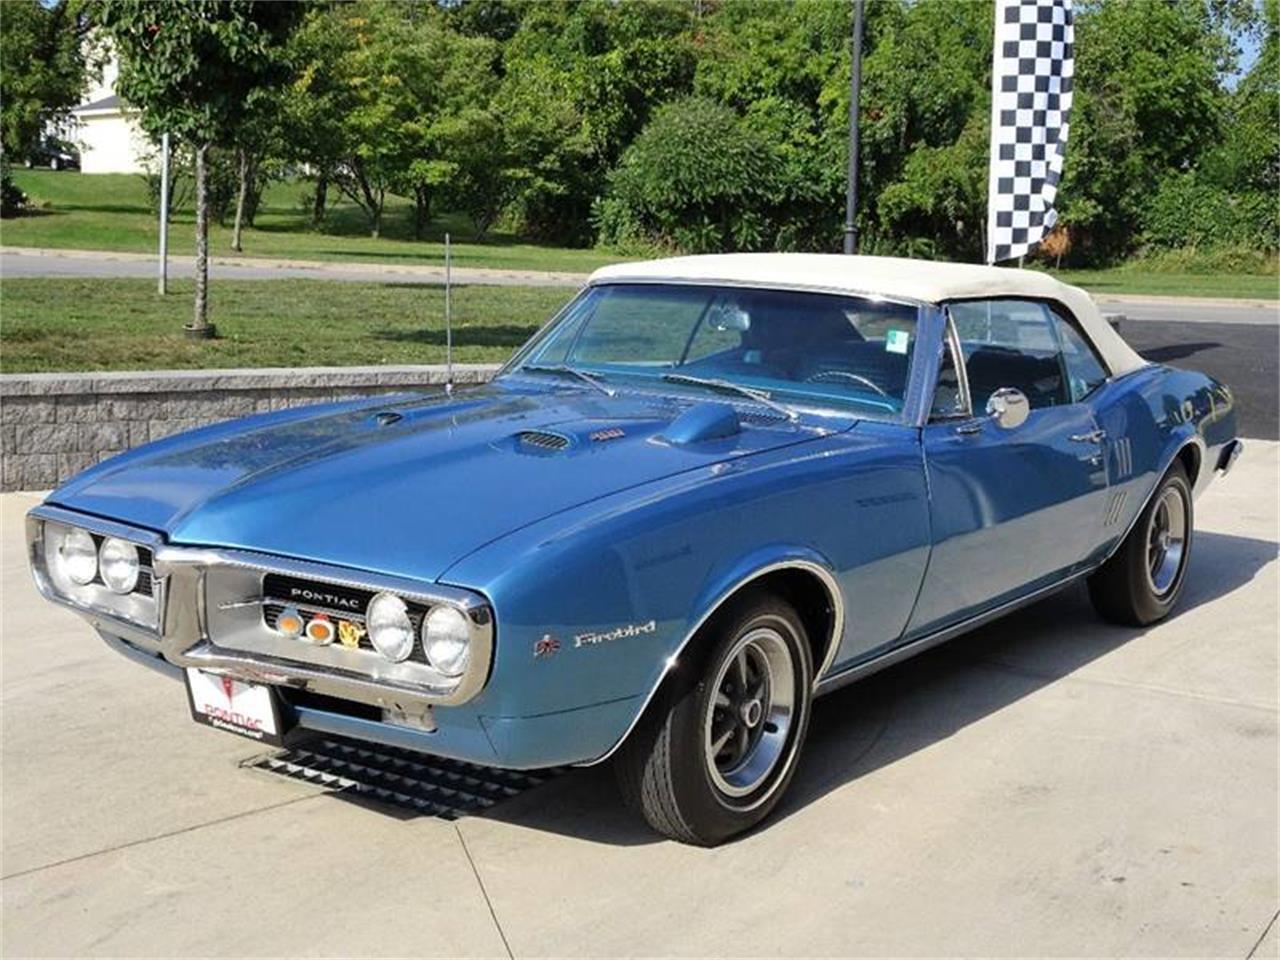 For Sale: 1967 Pontiac Firebird in Hilton, New York